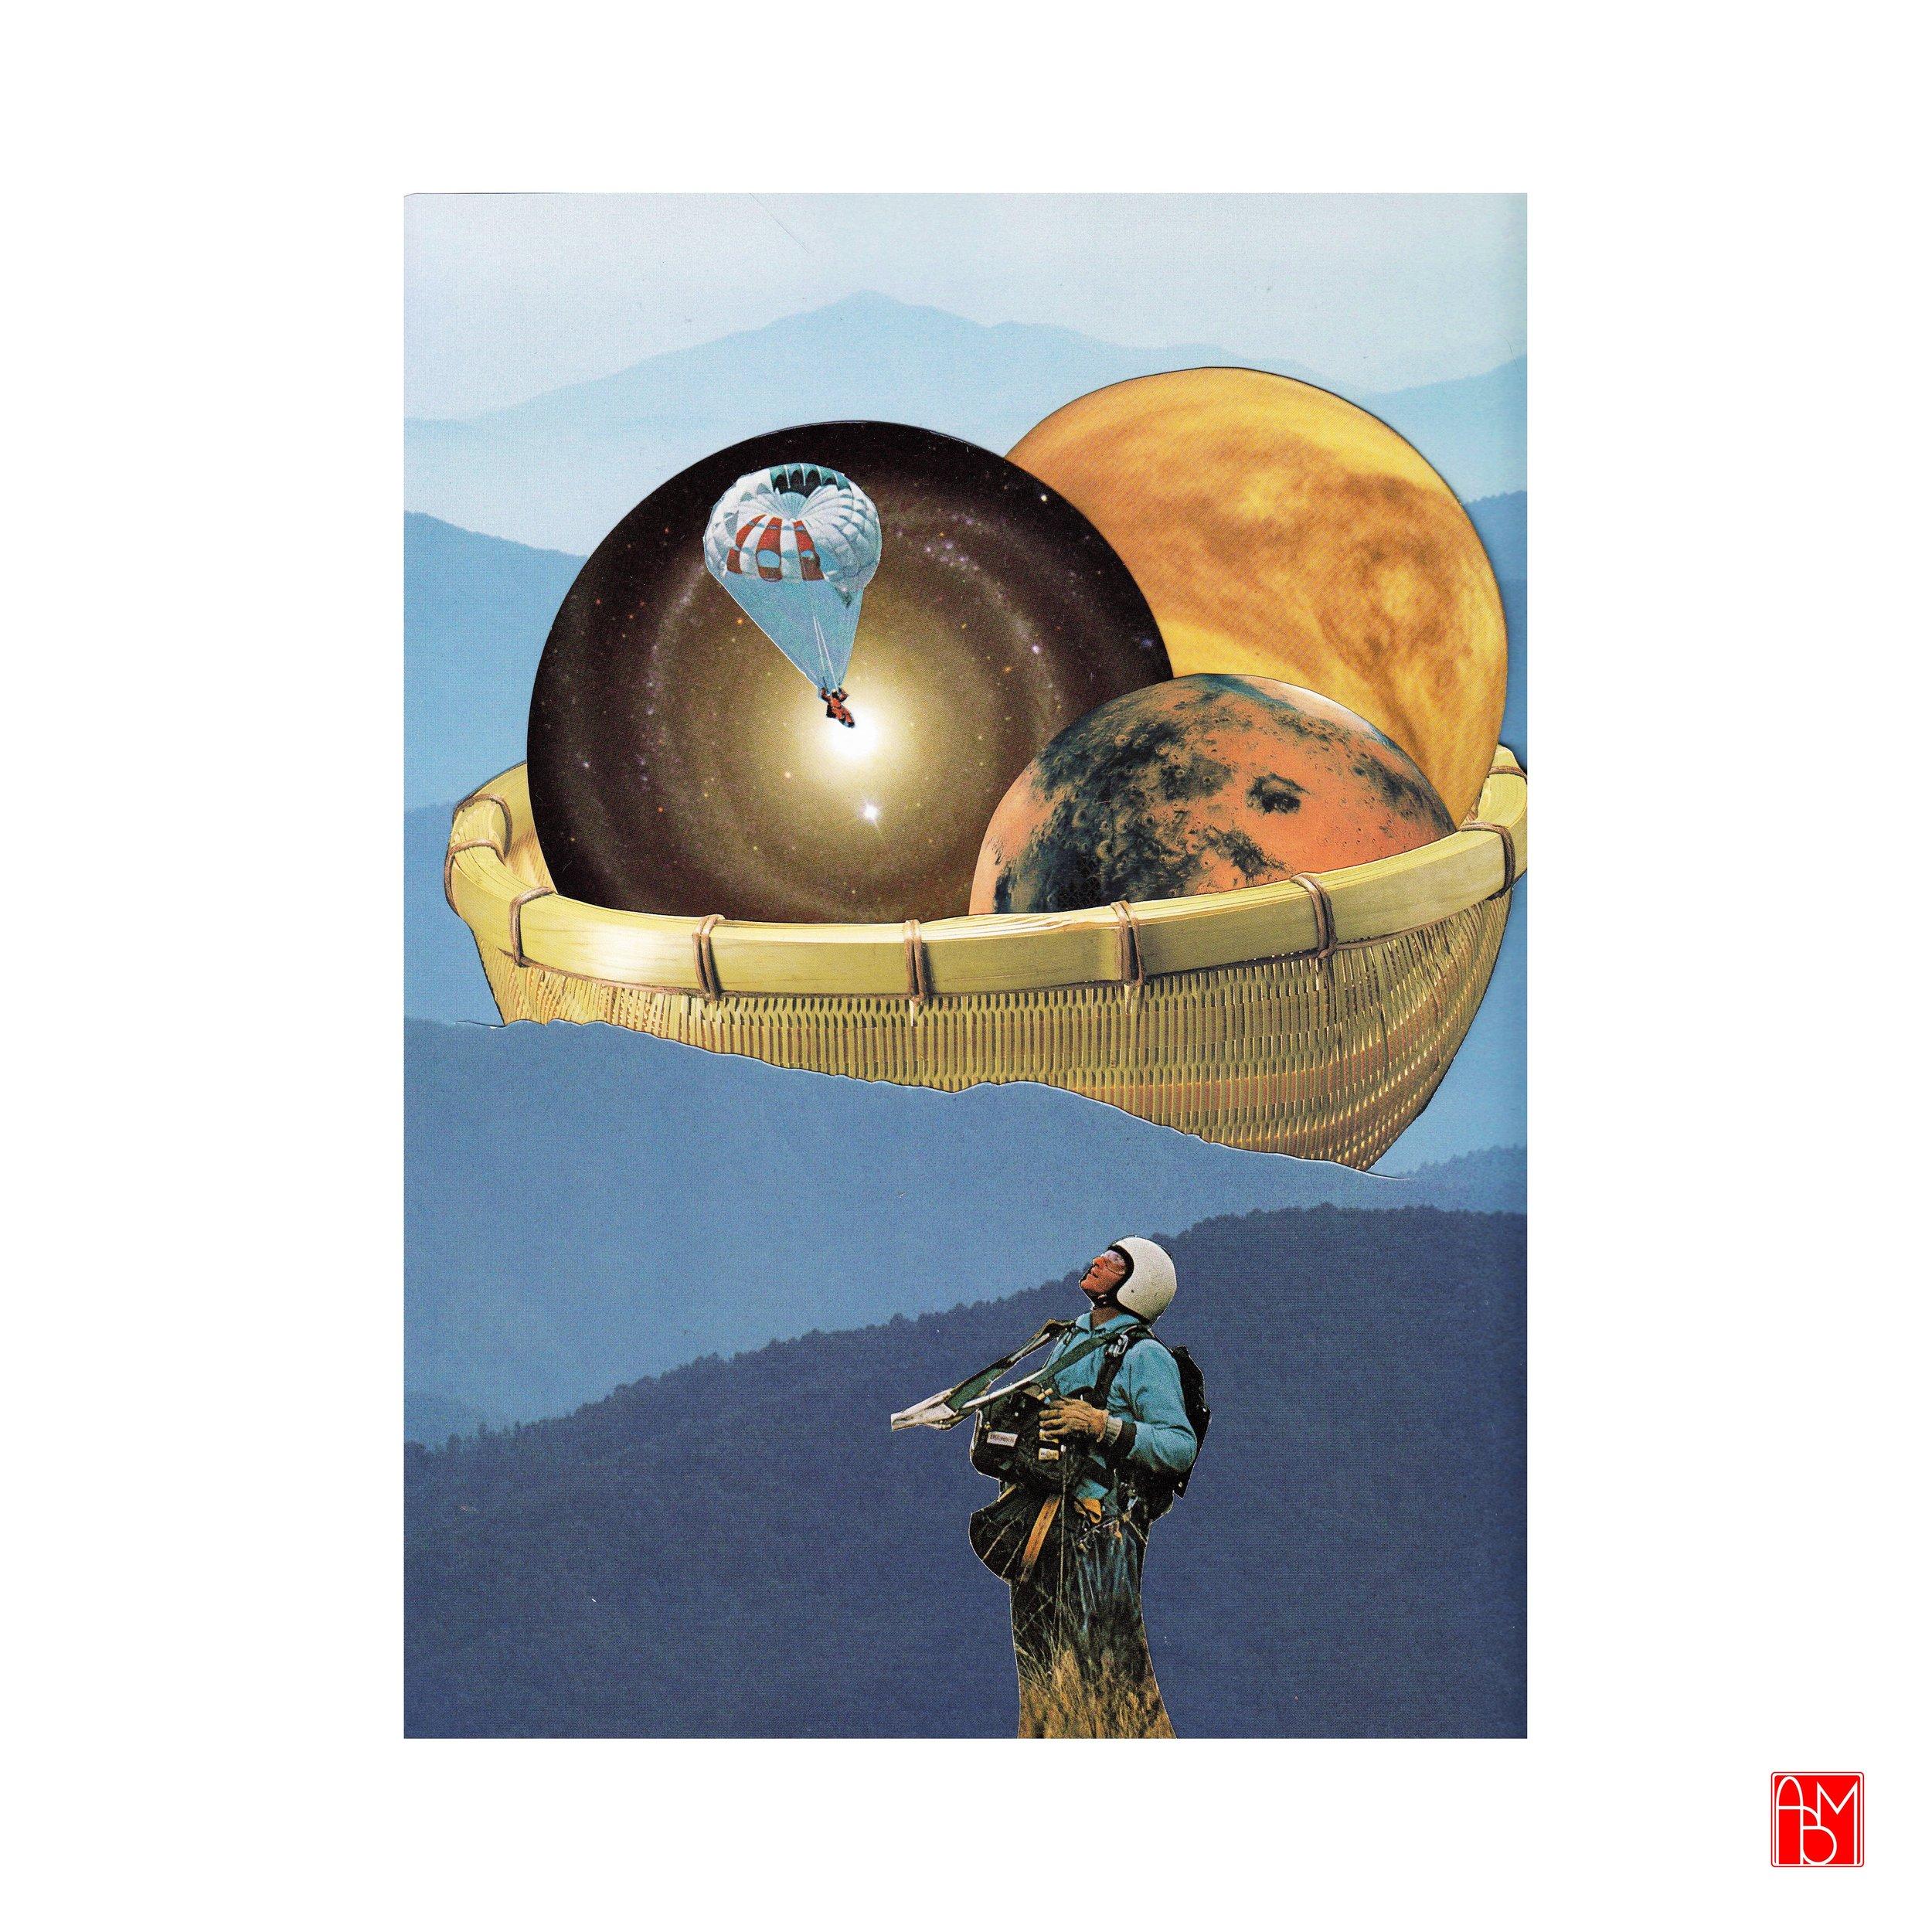 Buckaroo Banzai Skydiving Across the Milky Way.jpg